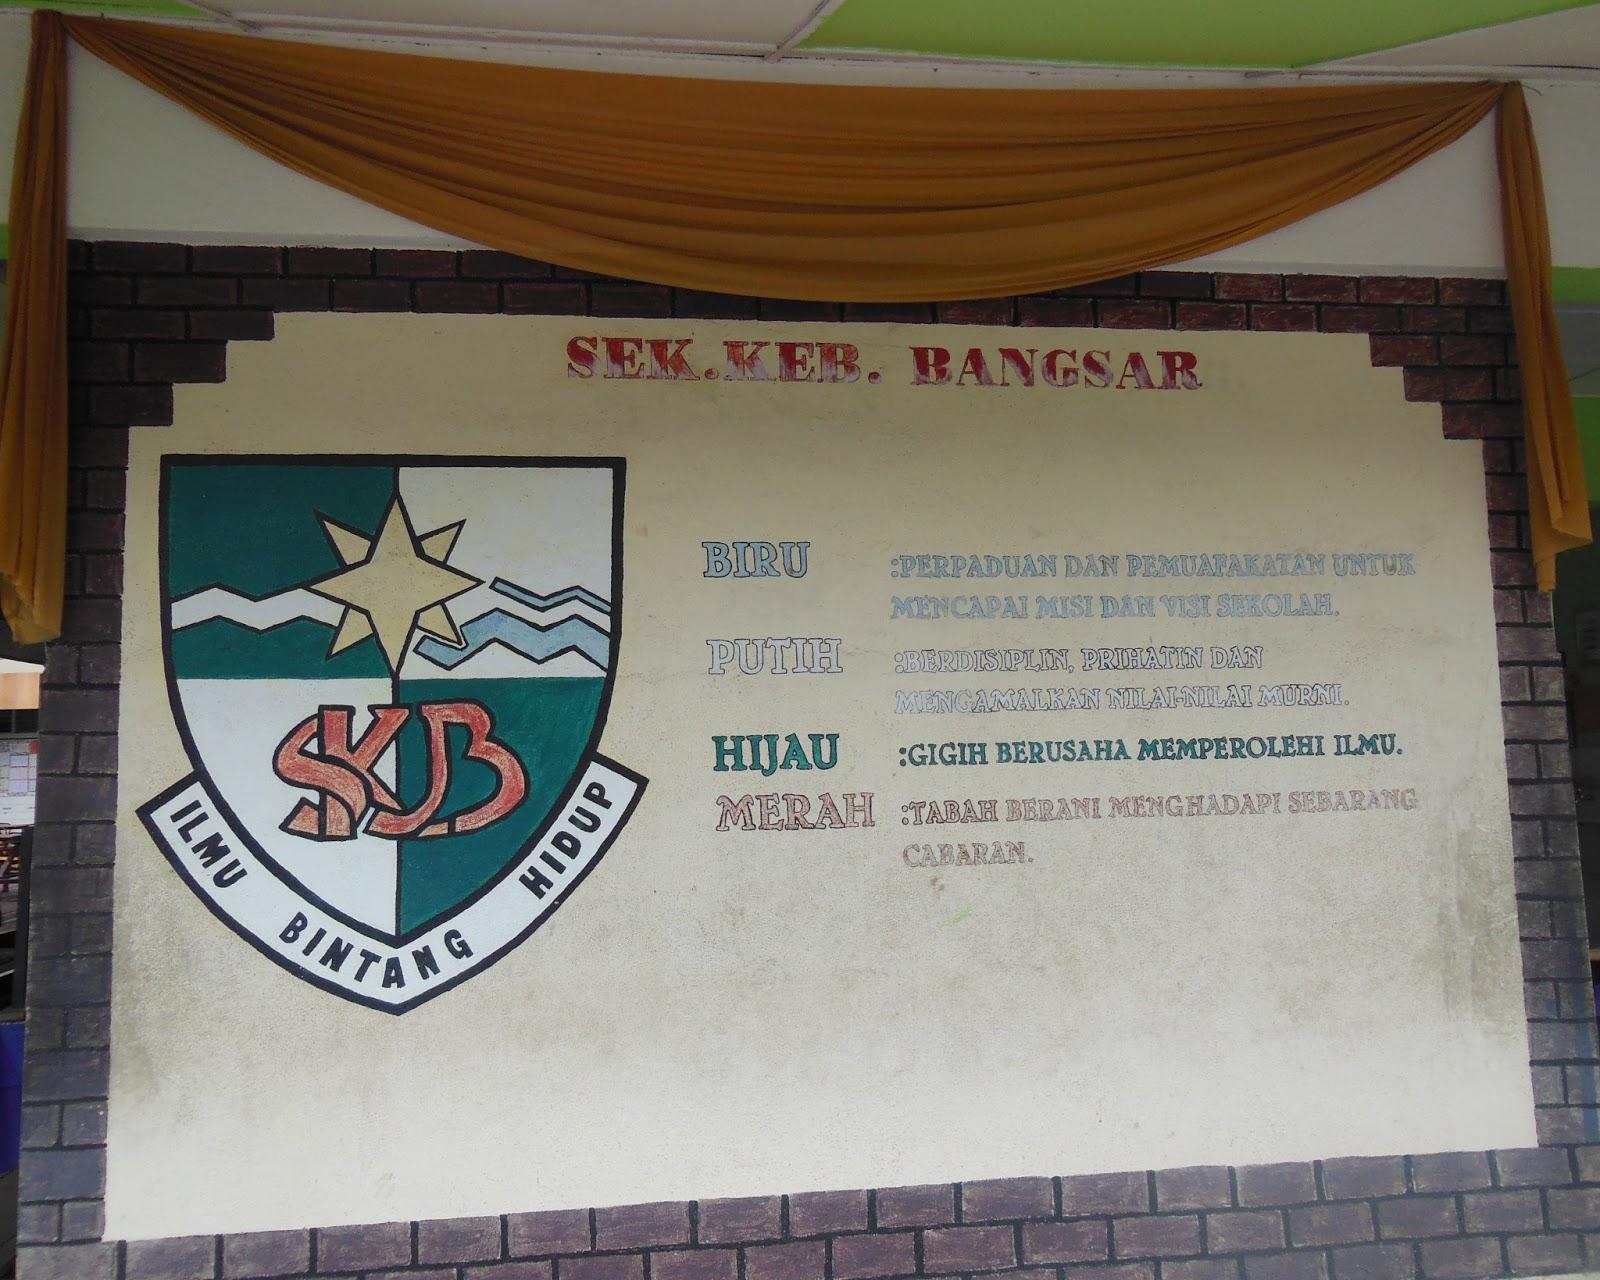 Pusat sumber sekolah lencana sekolah kebangsaan bangsar for Mural sekolah